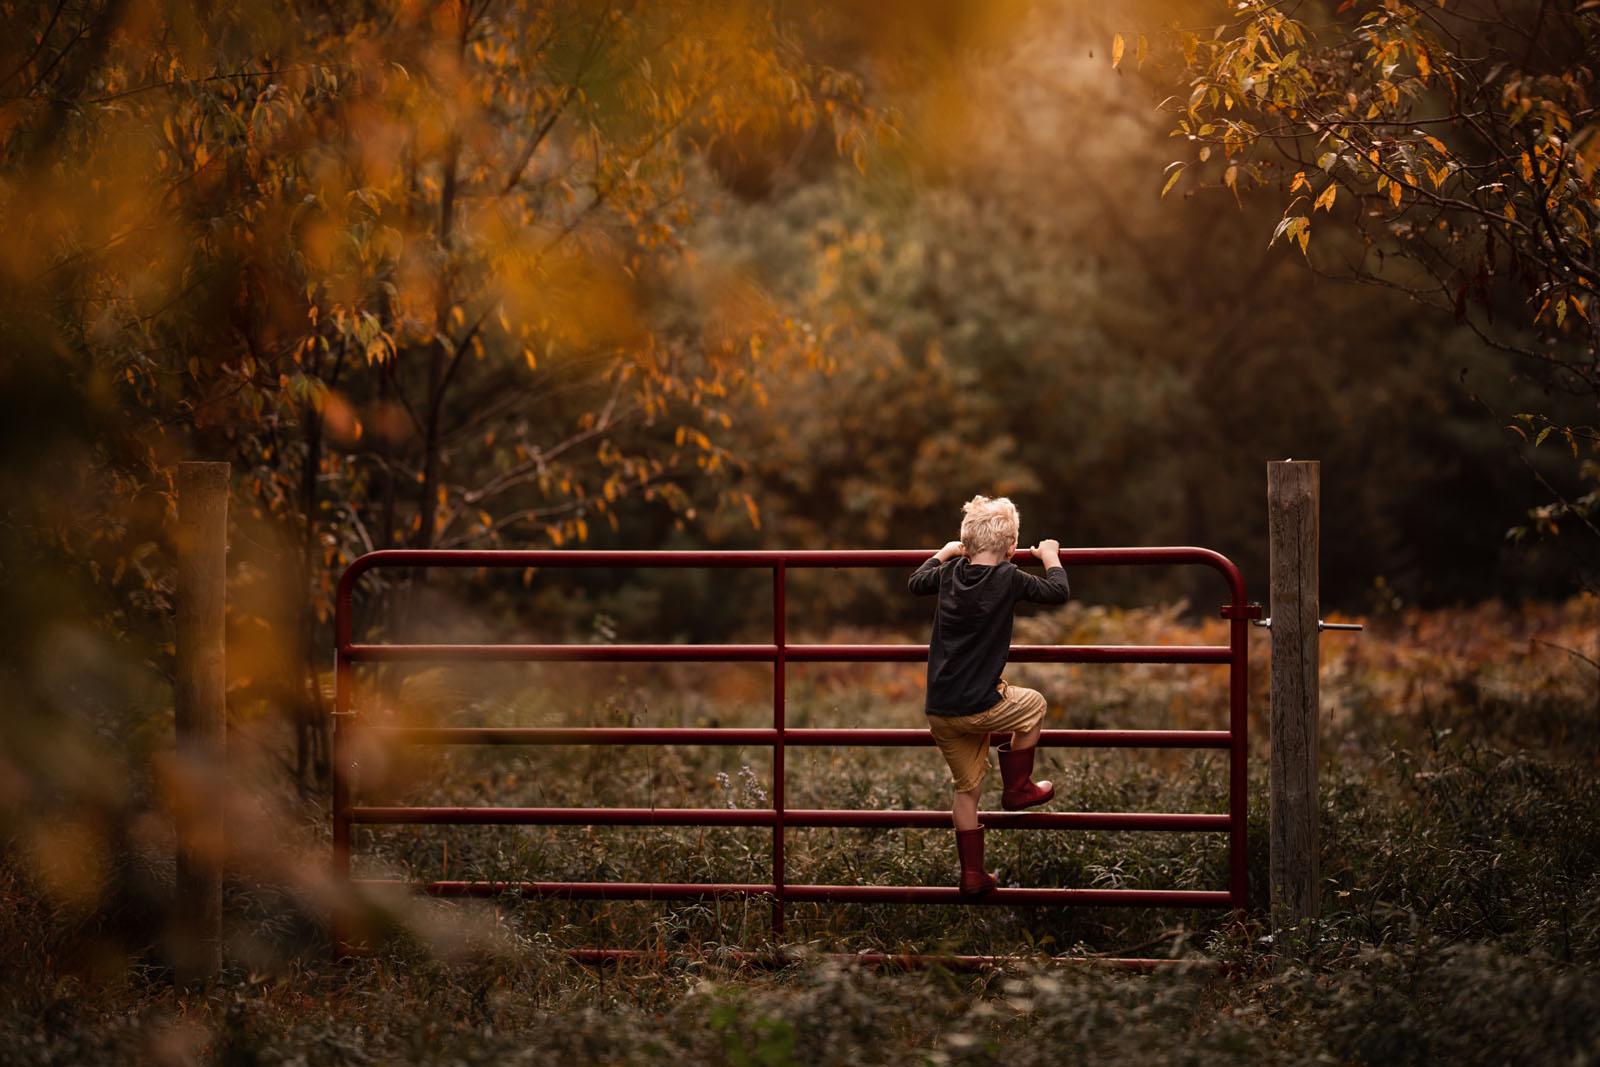 megloeks_image27 small child climbing gate in autumn fall activities meg loeks